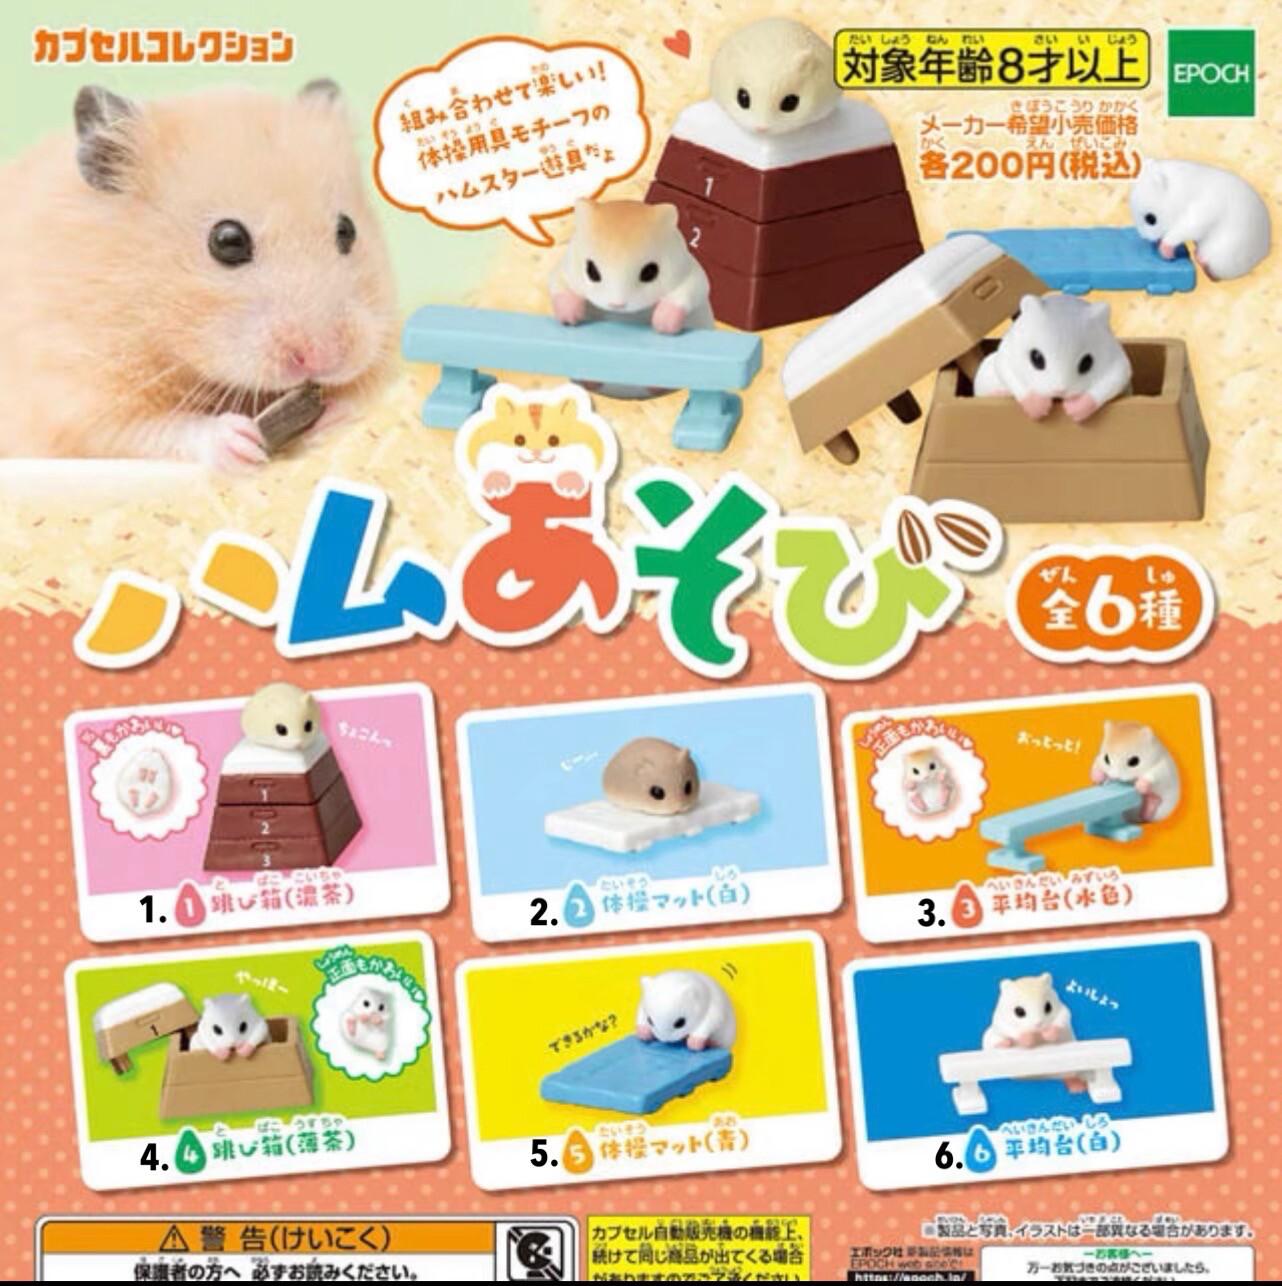 [NEW] Epoch Gymnastic Hamster Miniature Gashapon